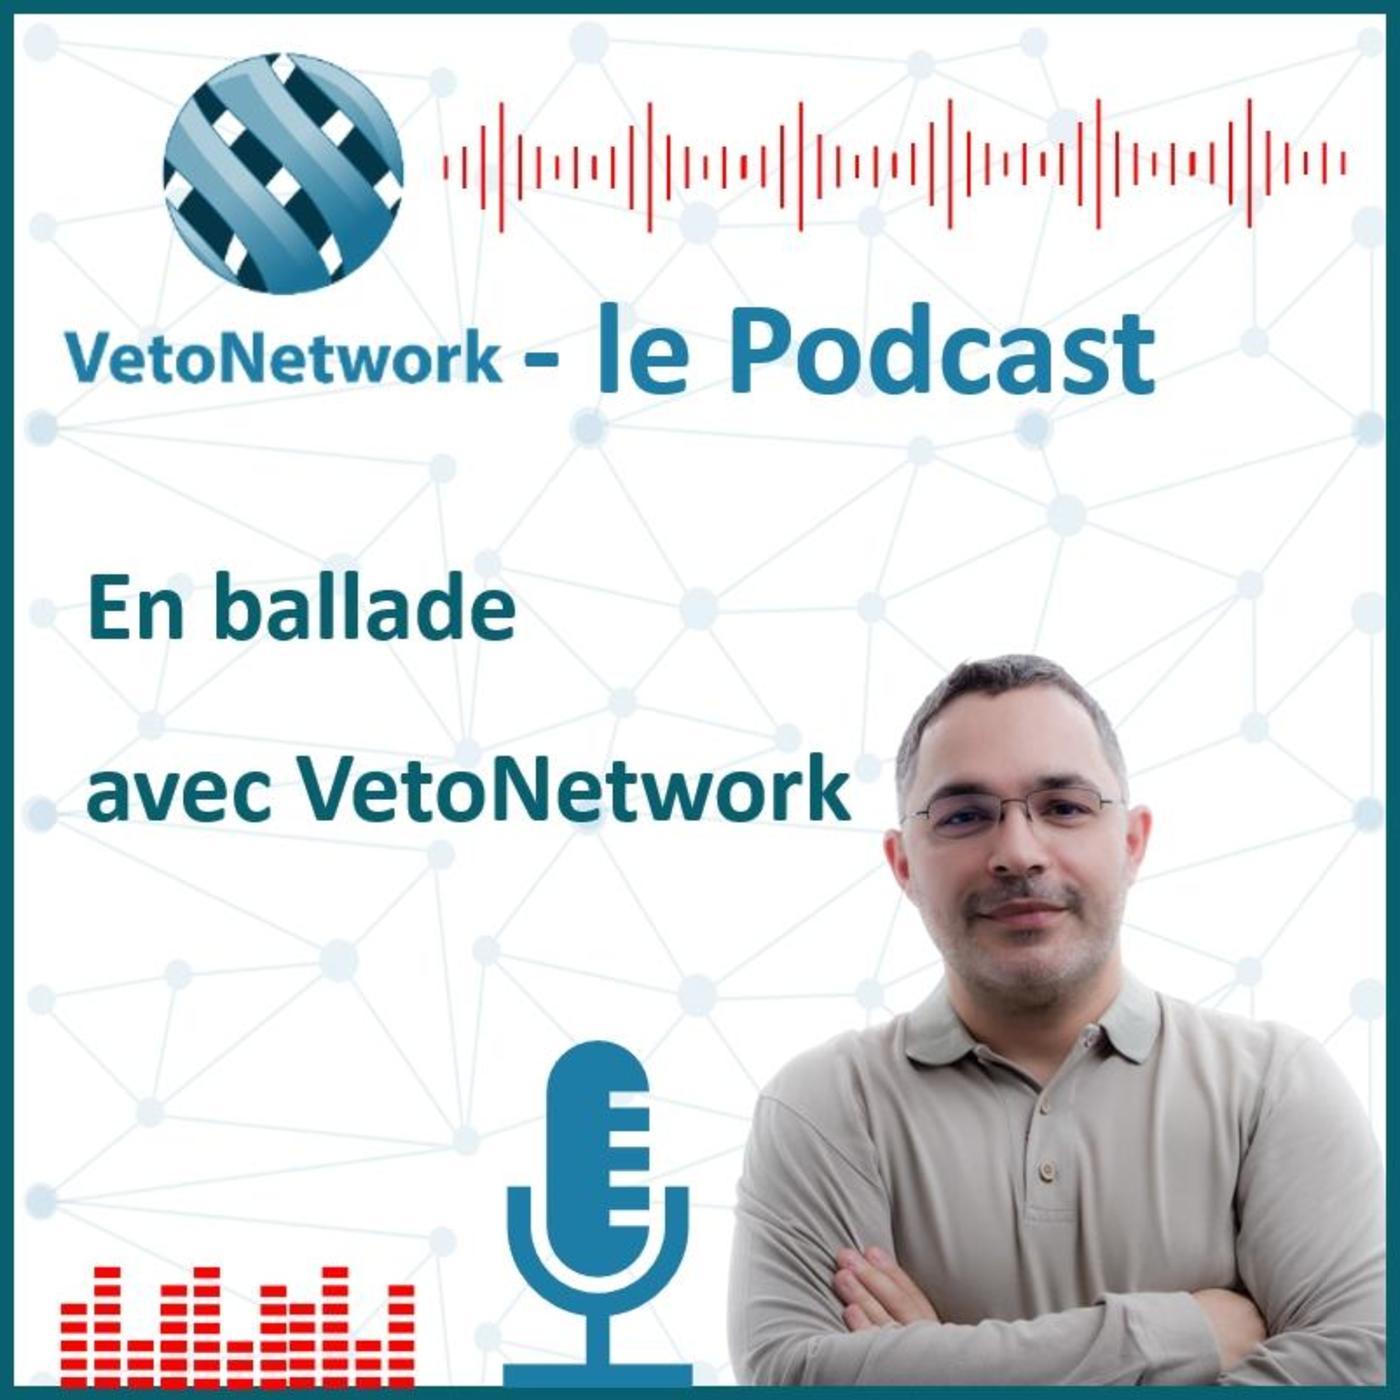 🌎 En ballade avec VetoNetwork - le Podcast 📲